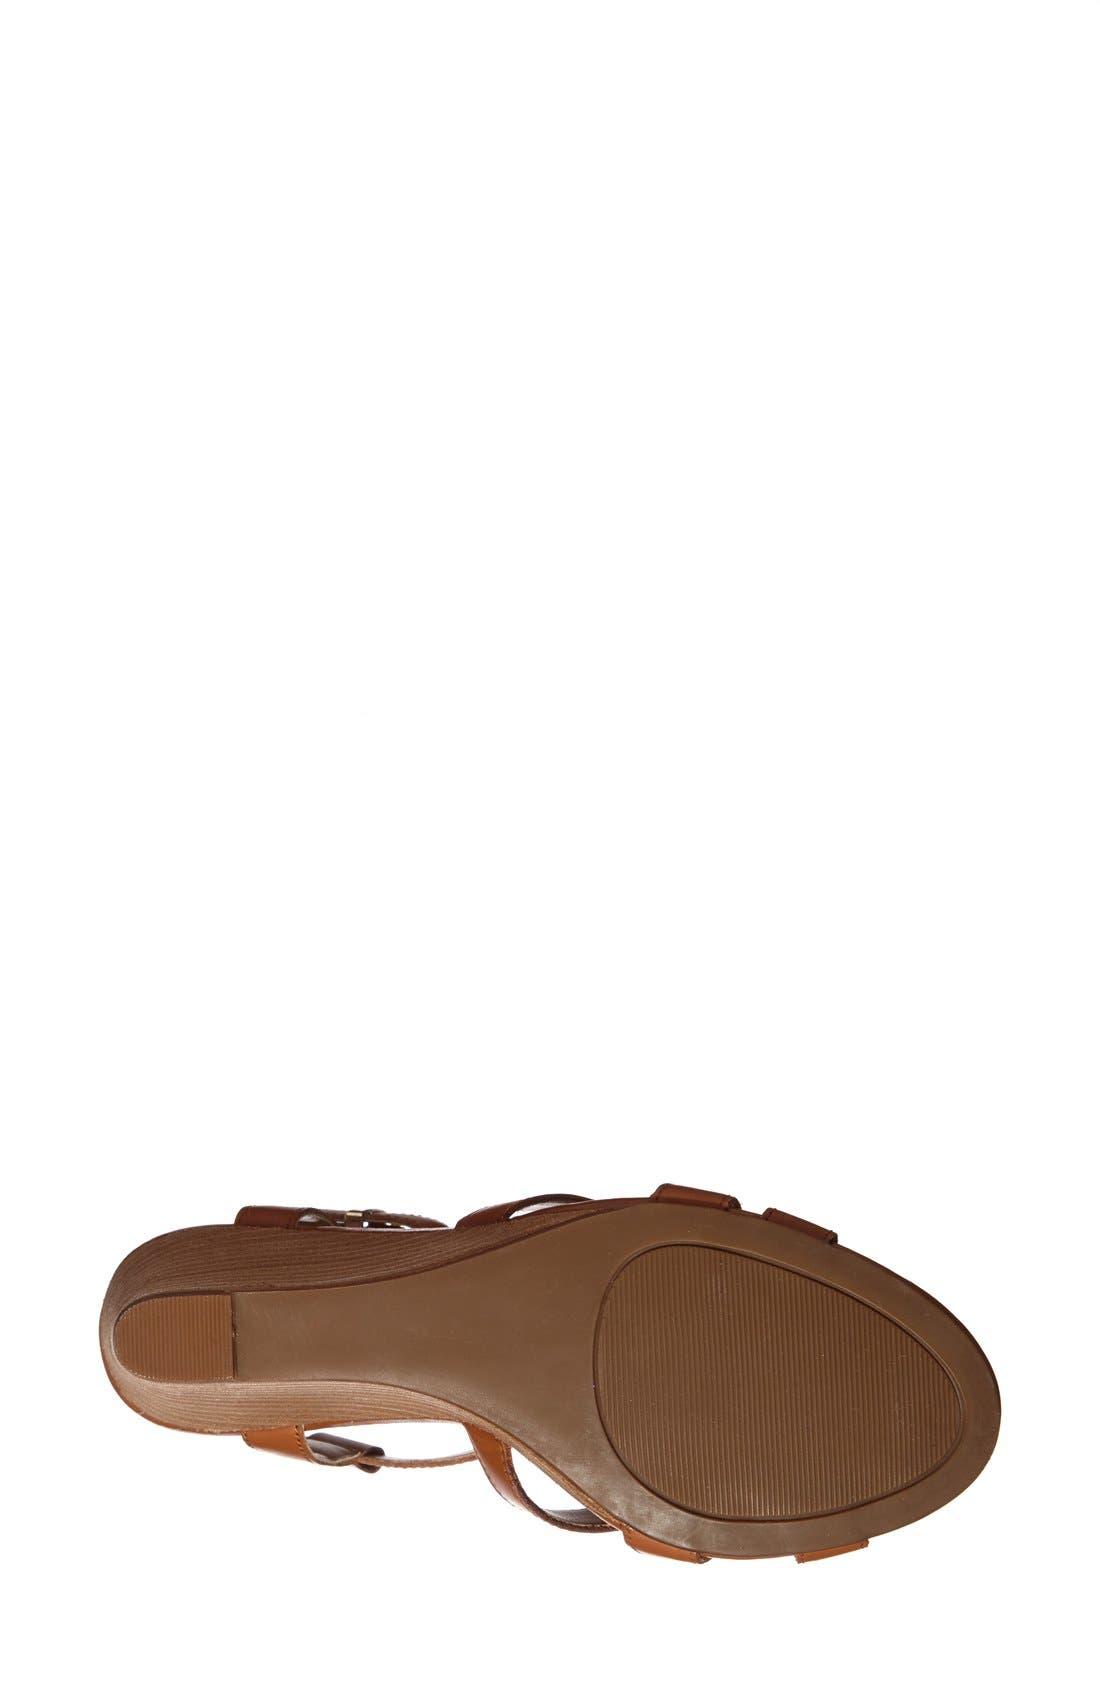 Alternate Image 4  - Sole Society 'Metsey' Wedge Sandal (Women)